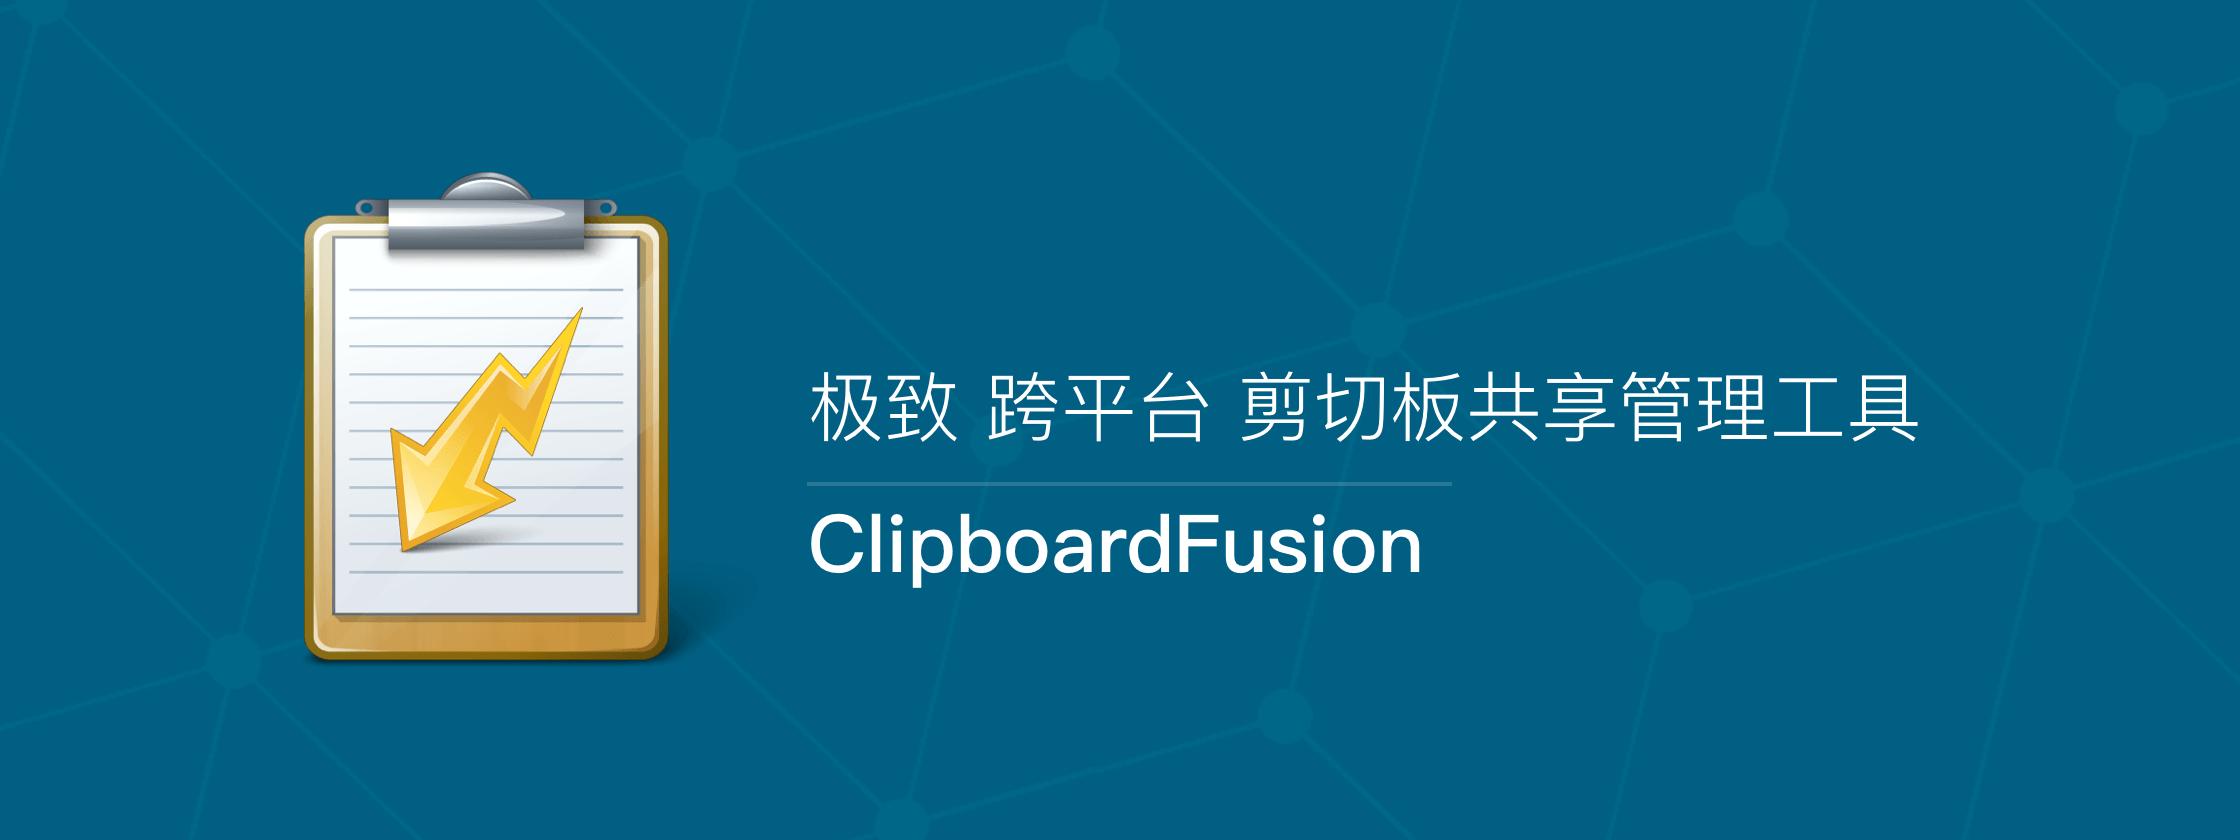 ClipboardFusion – 极致 跨平台 剪切板共享管理工具